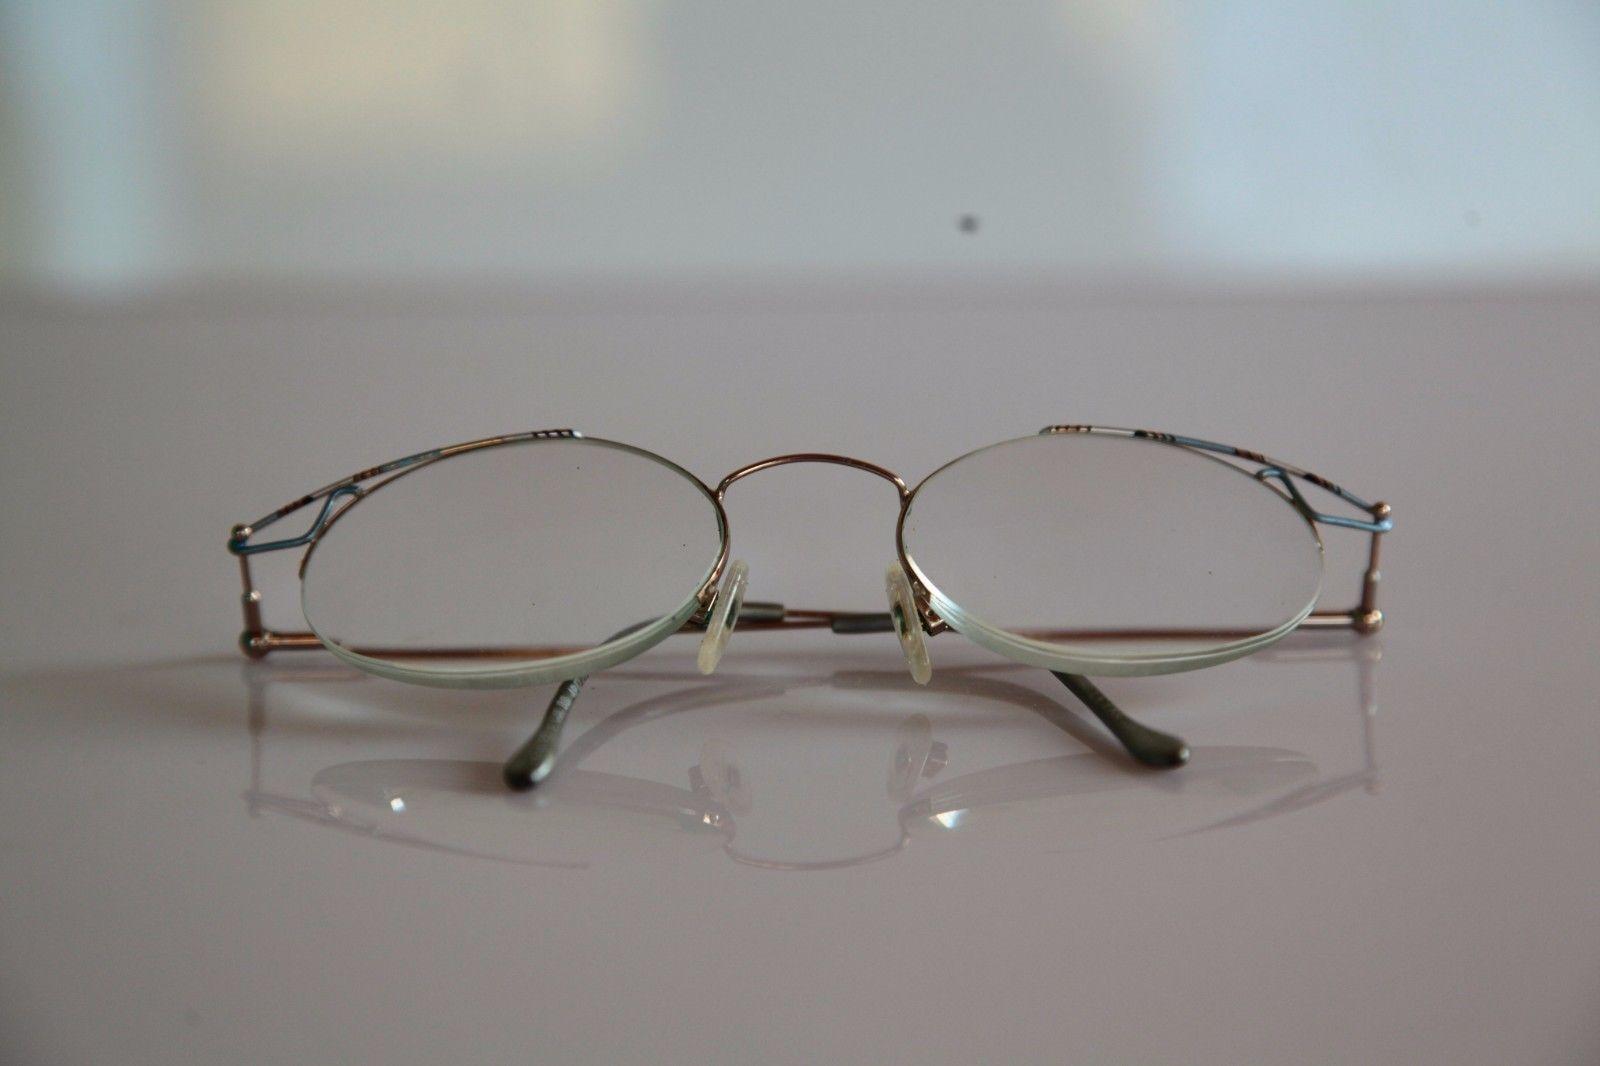 EBM Eyewear, Gold Half Rim Frame,  RX-Able Prescription Lenses. Germany